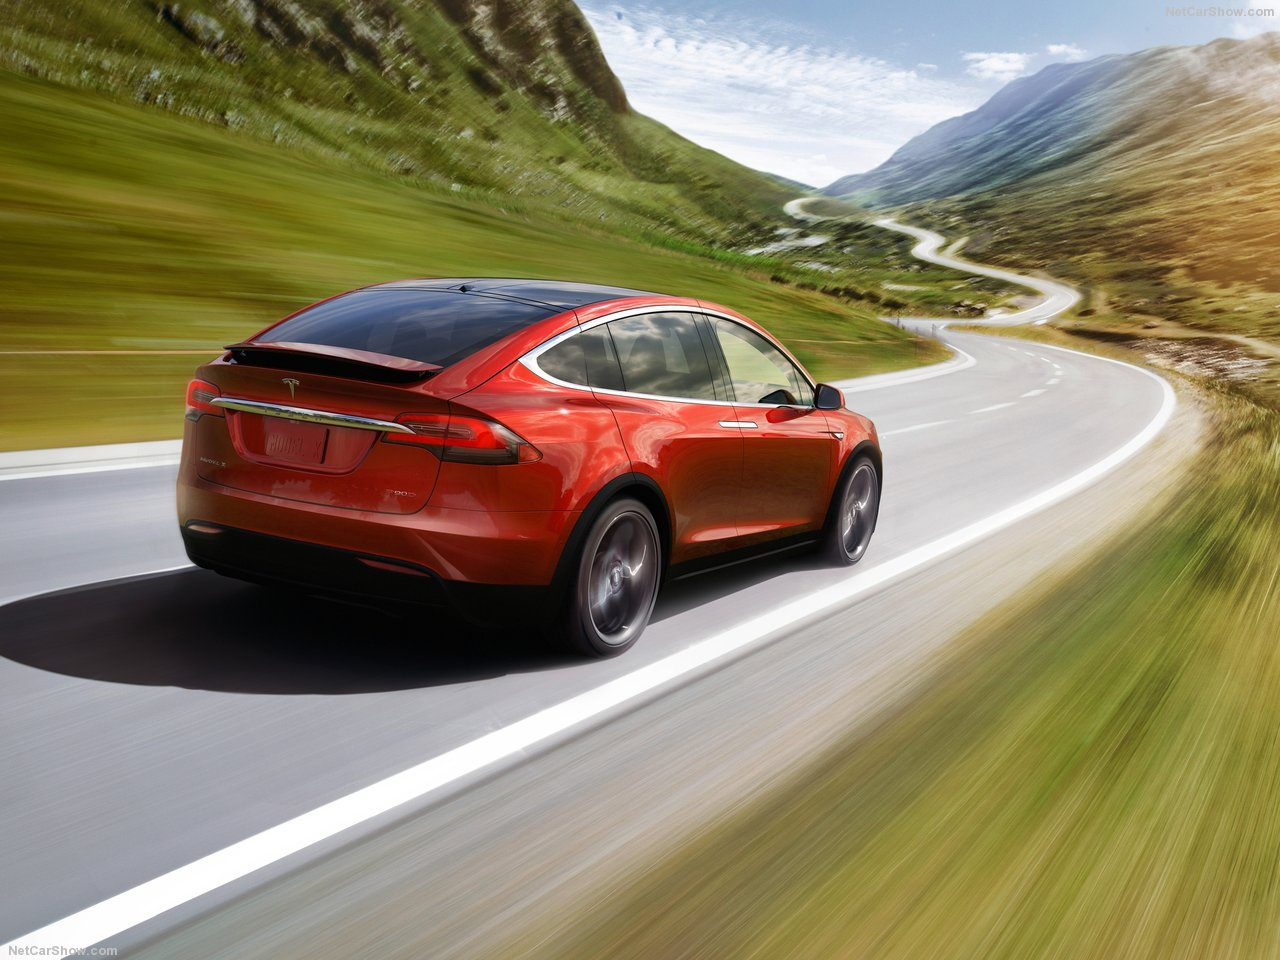 Tesla-Model_X_2017_1280x960_wallpaper_07